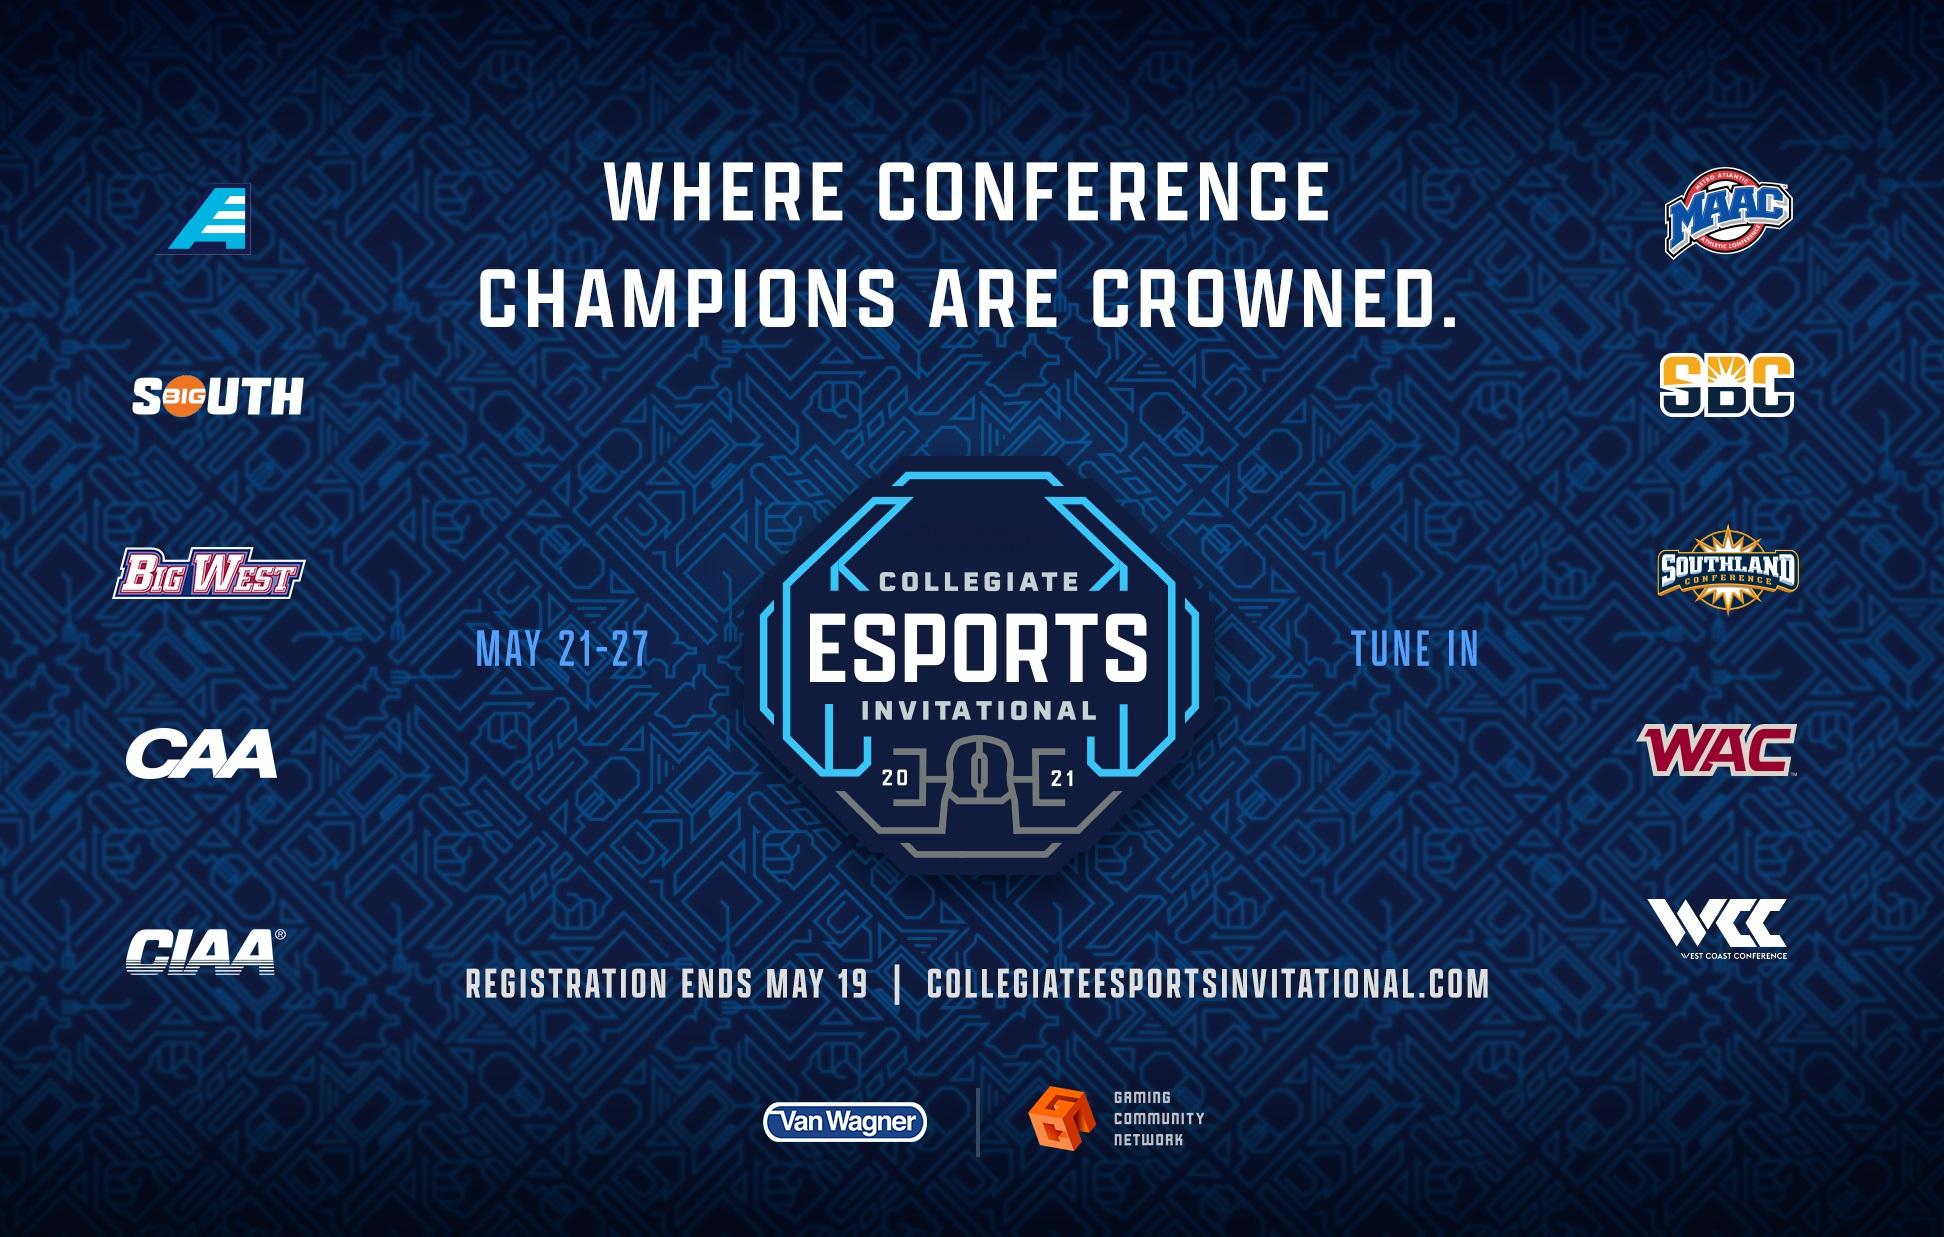 Registrations Open for Collegiate Esports Invitational Feat. Fortnite